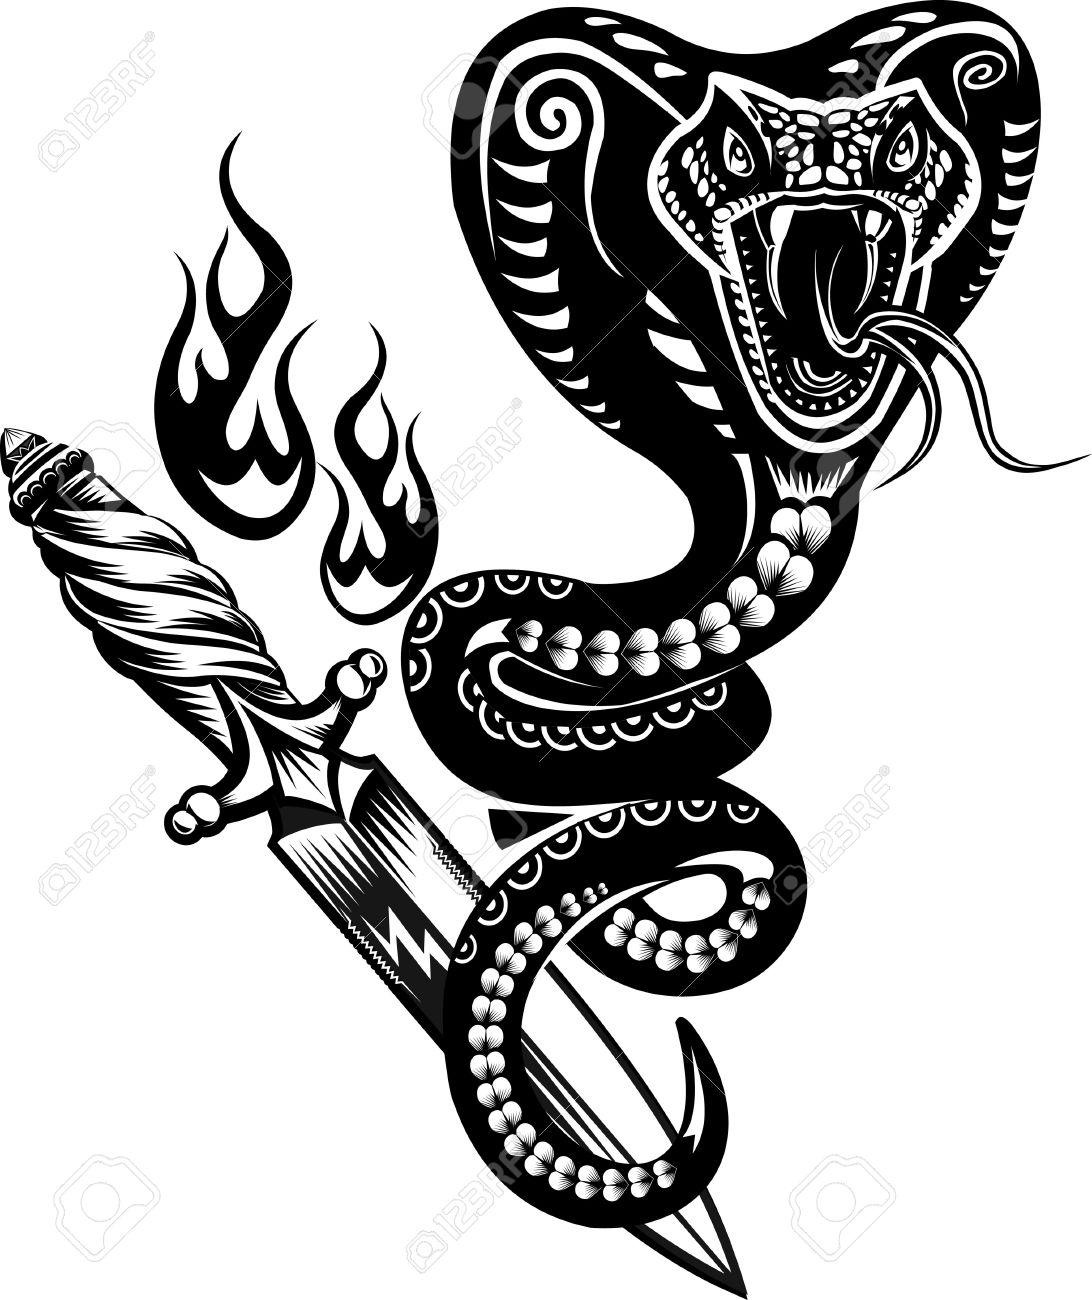 Snake Tattoo Cobra - 50058214